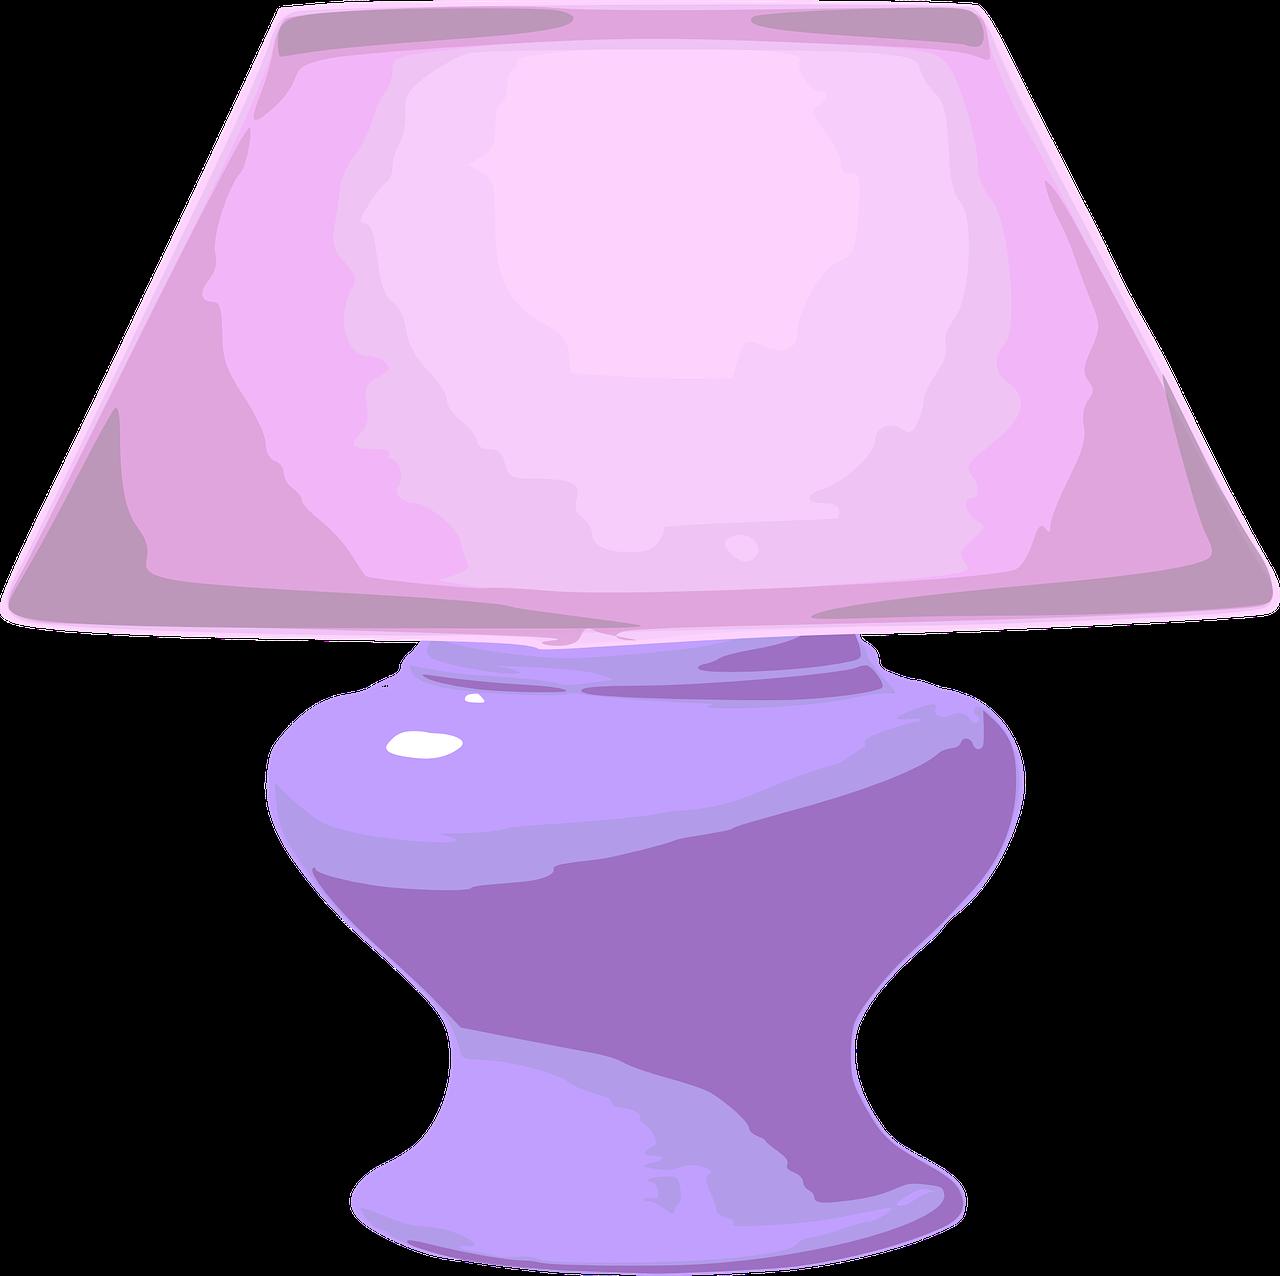 Furniture clipart pink lamp. Home decor purple cartoon